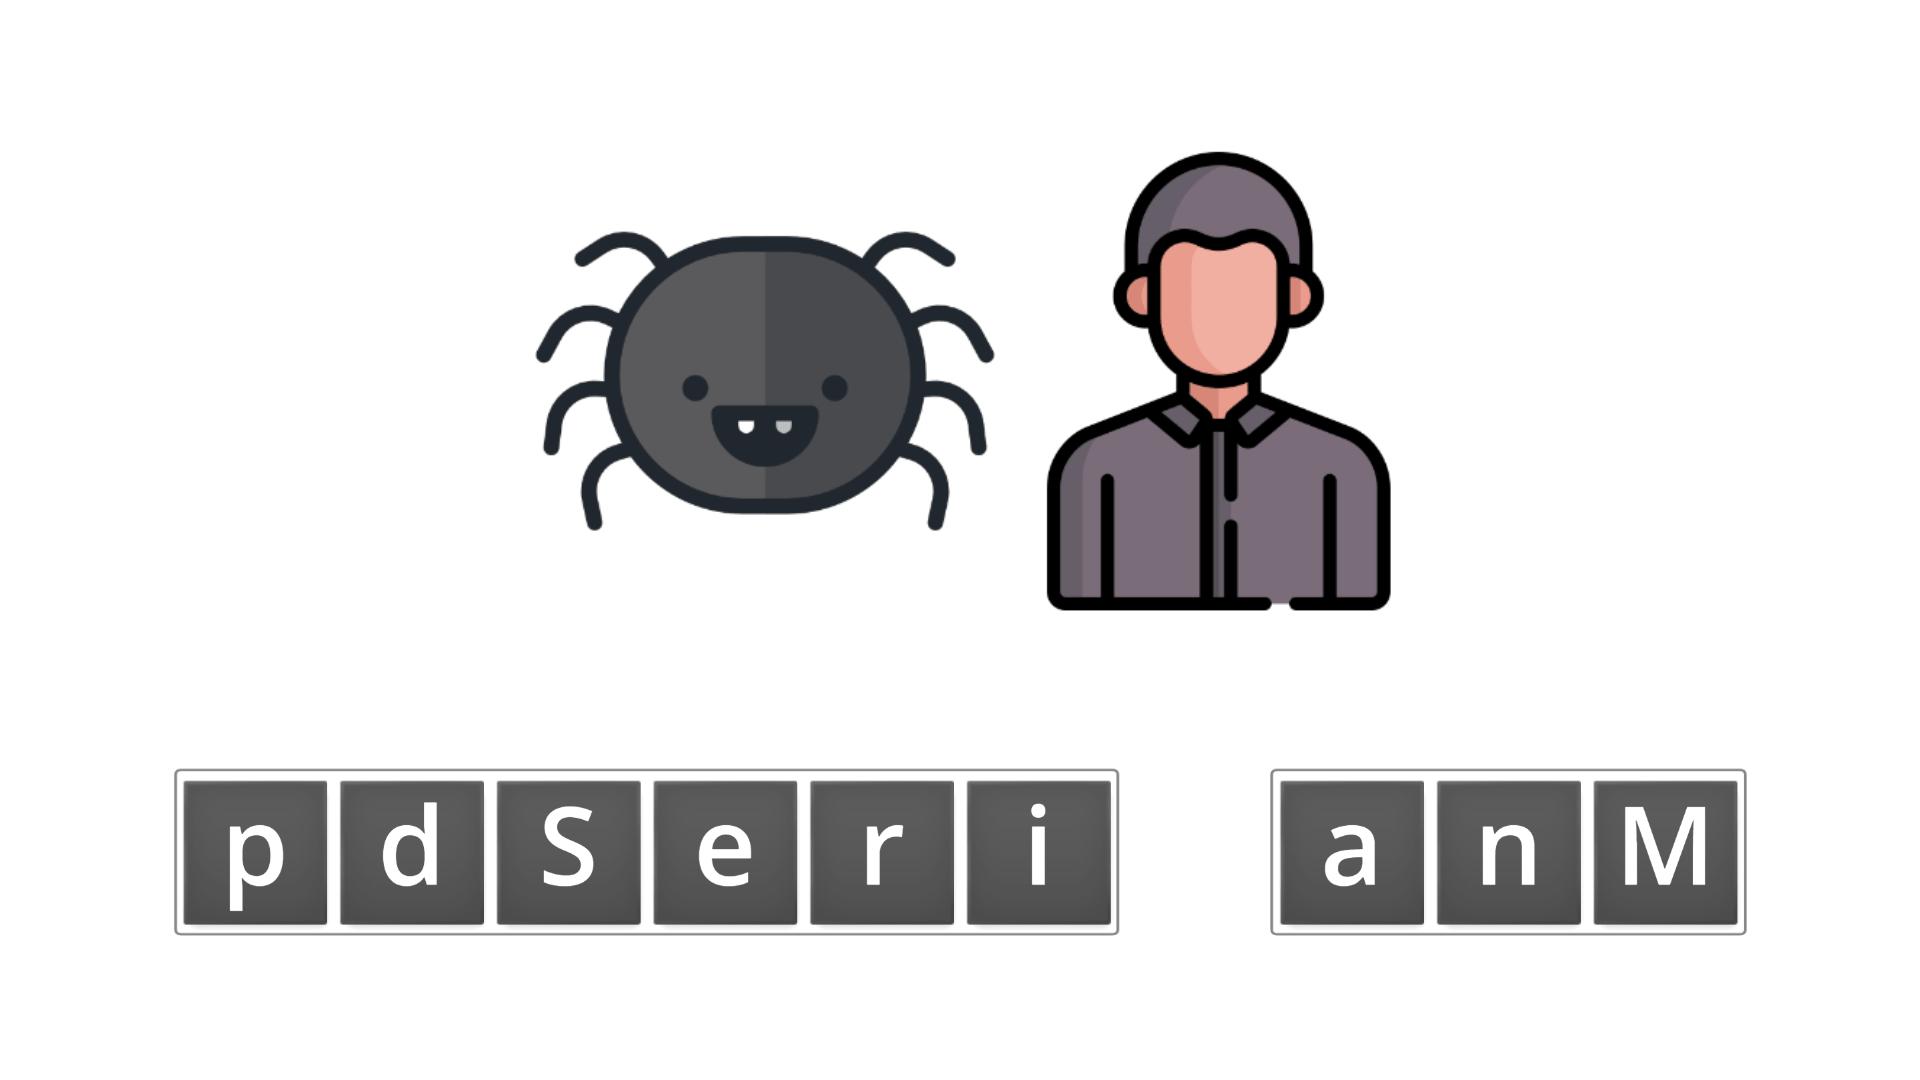 esl resources - flashcards - compound nouns  - unscramble - spider man